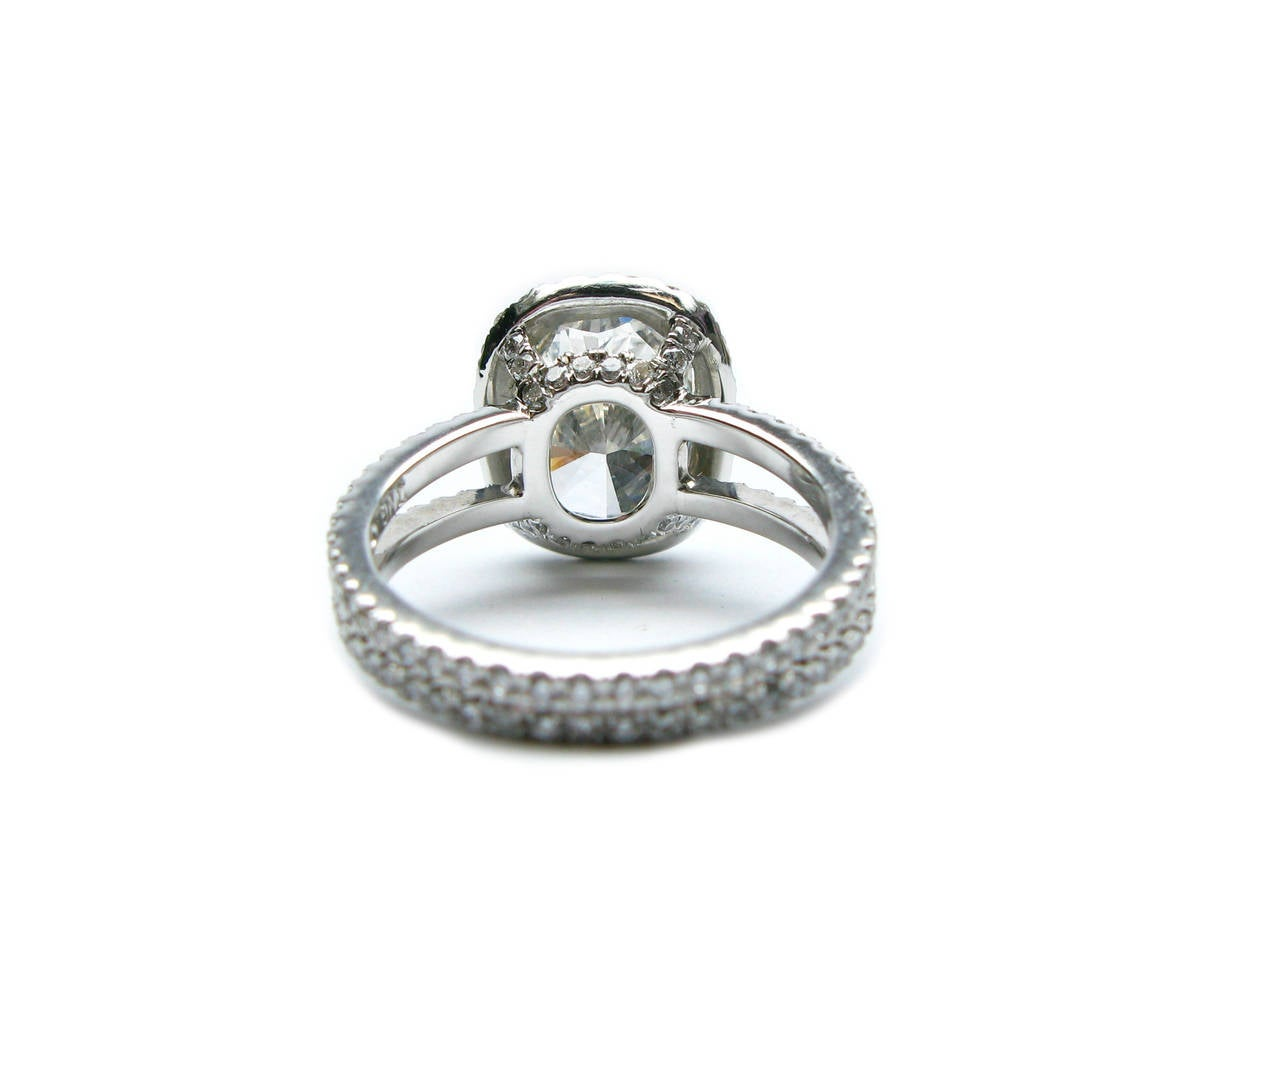 4 01 Carat GIA Cert Cushion Cut Diamond Platinum Halo Ring at 1stdibs